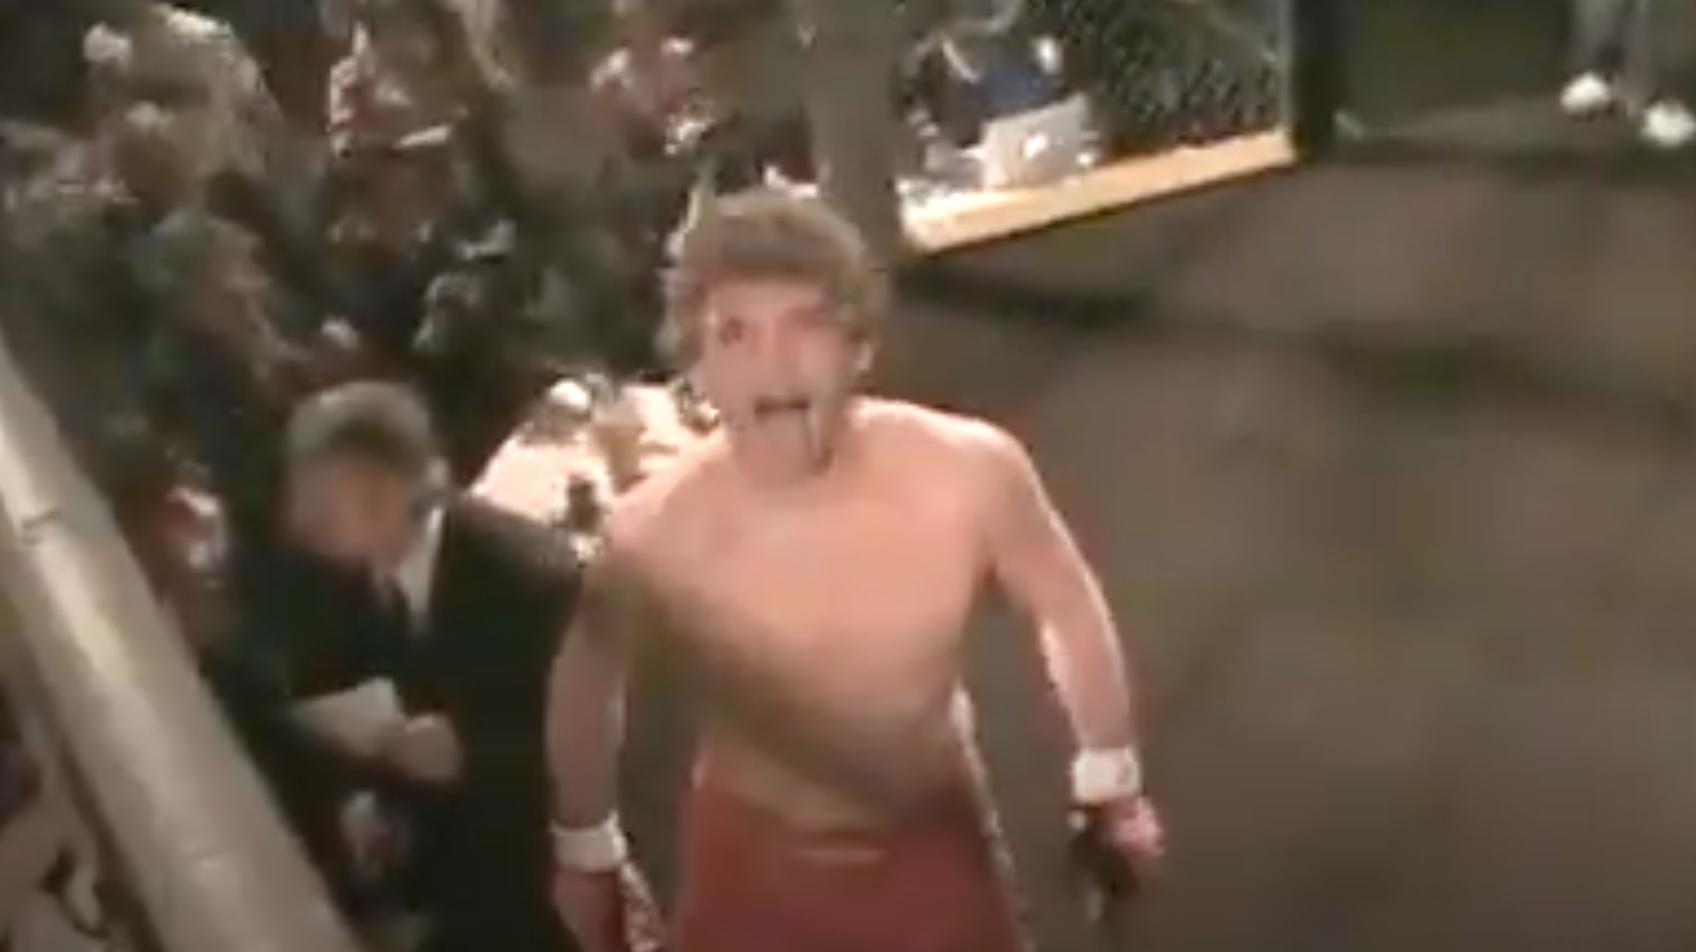 Ben Askren during his 2009 MMA debut against Josh Flowers.